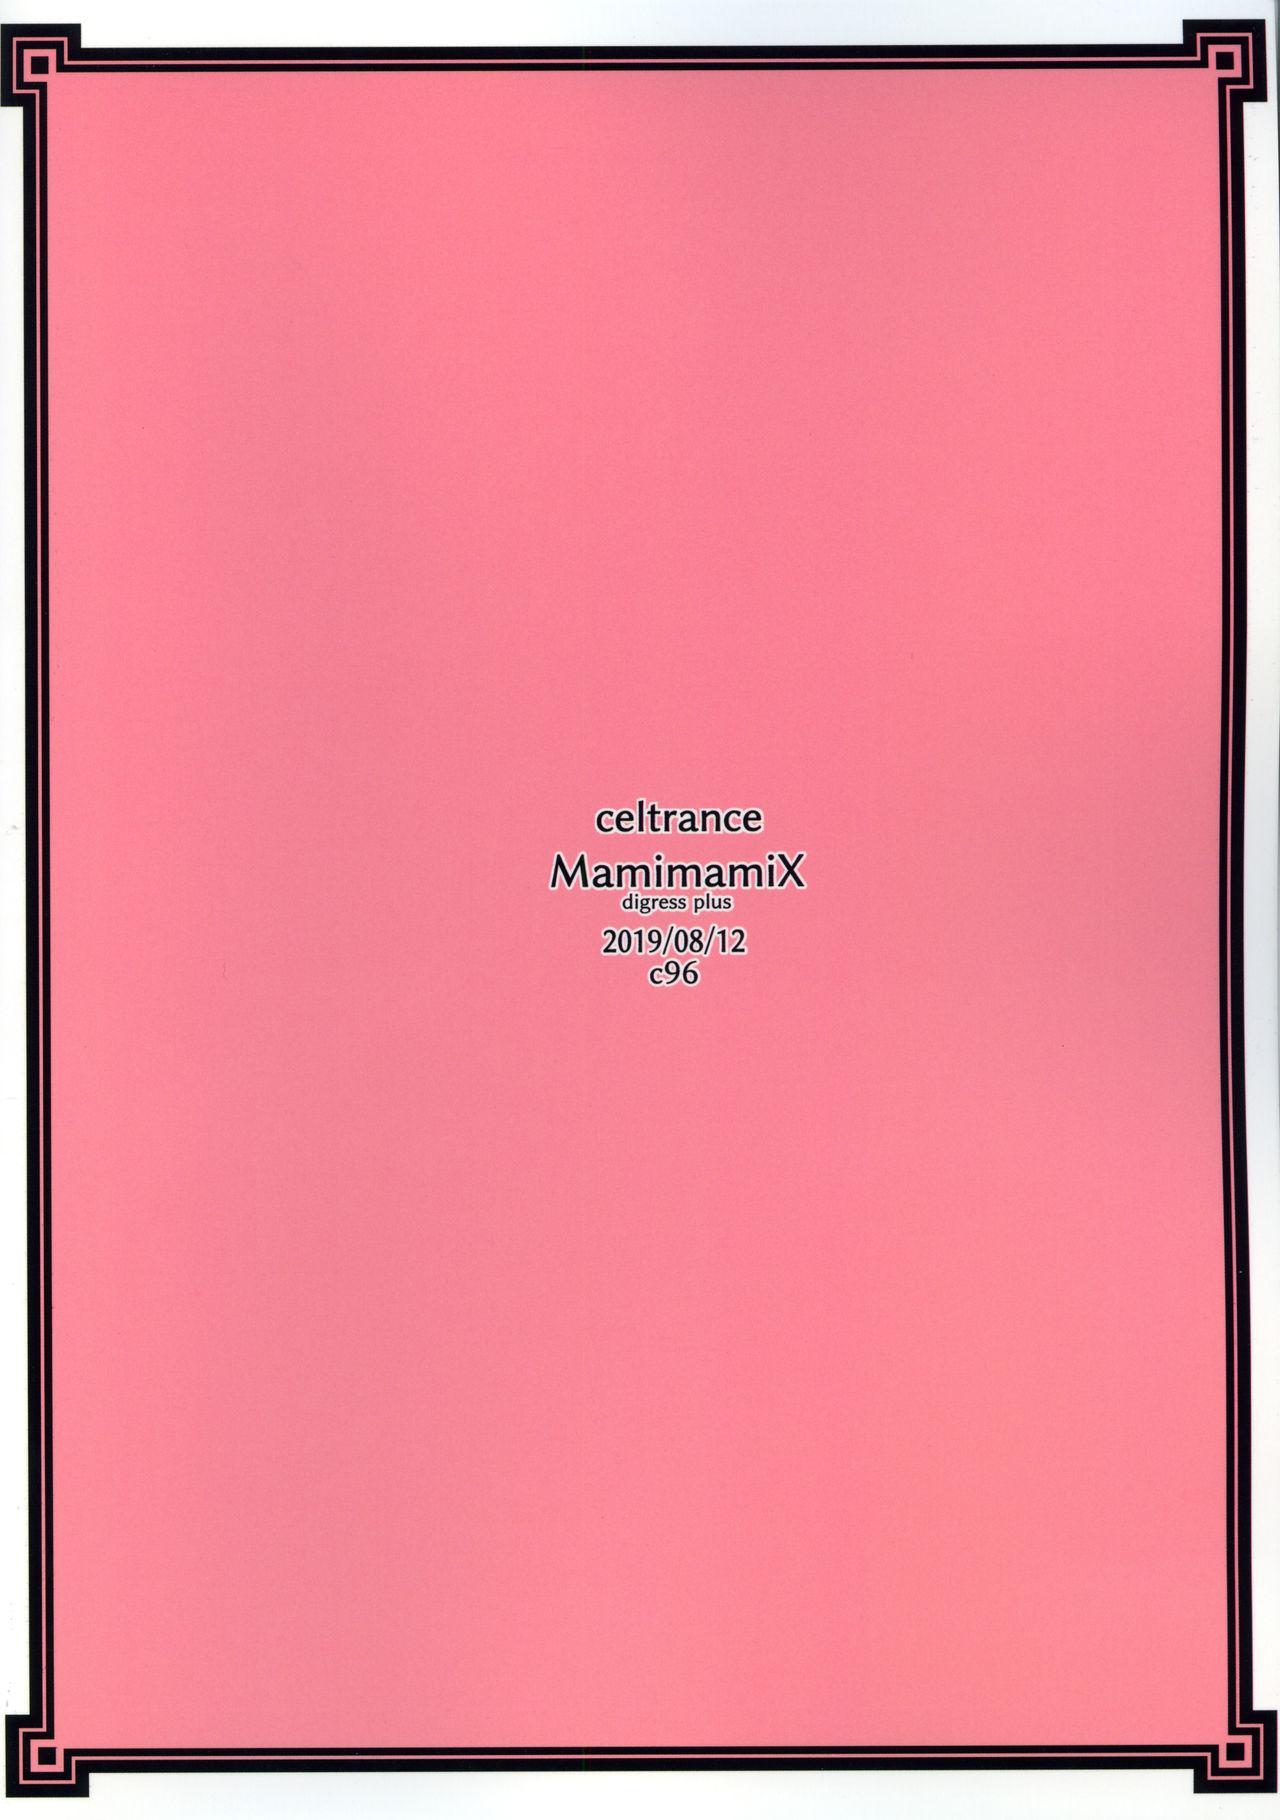 MamimamiX digress plus 29